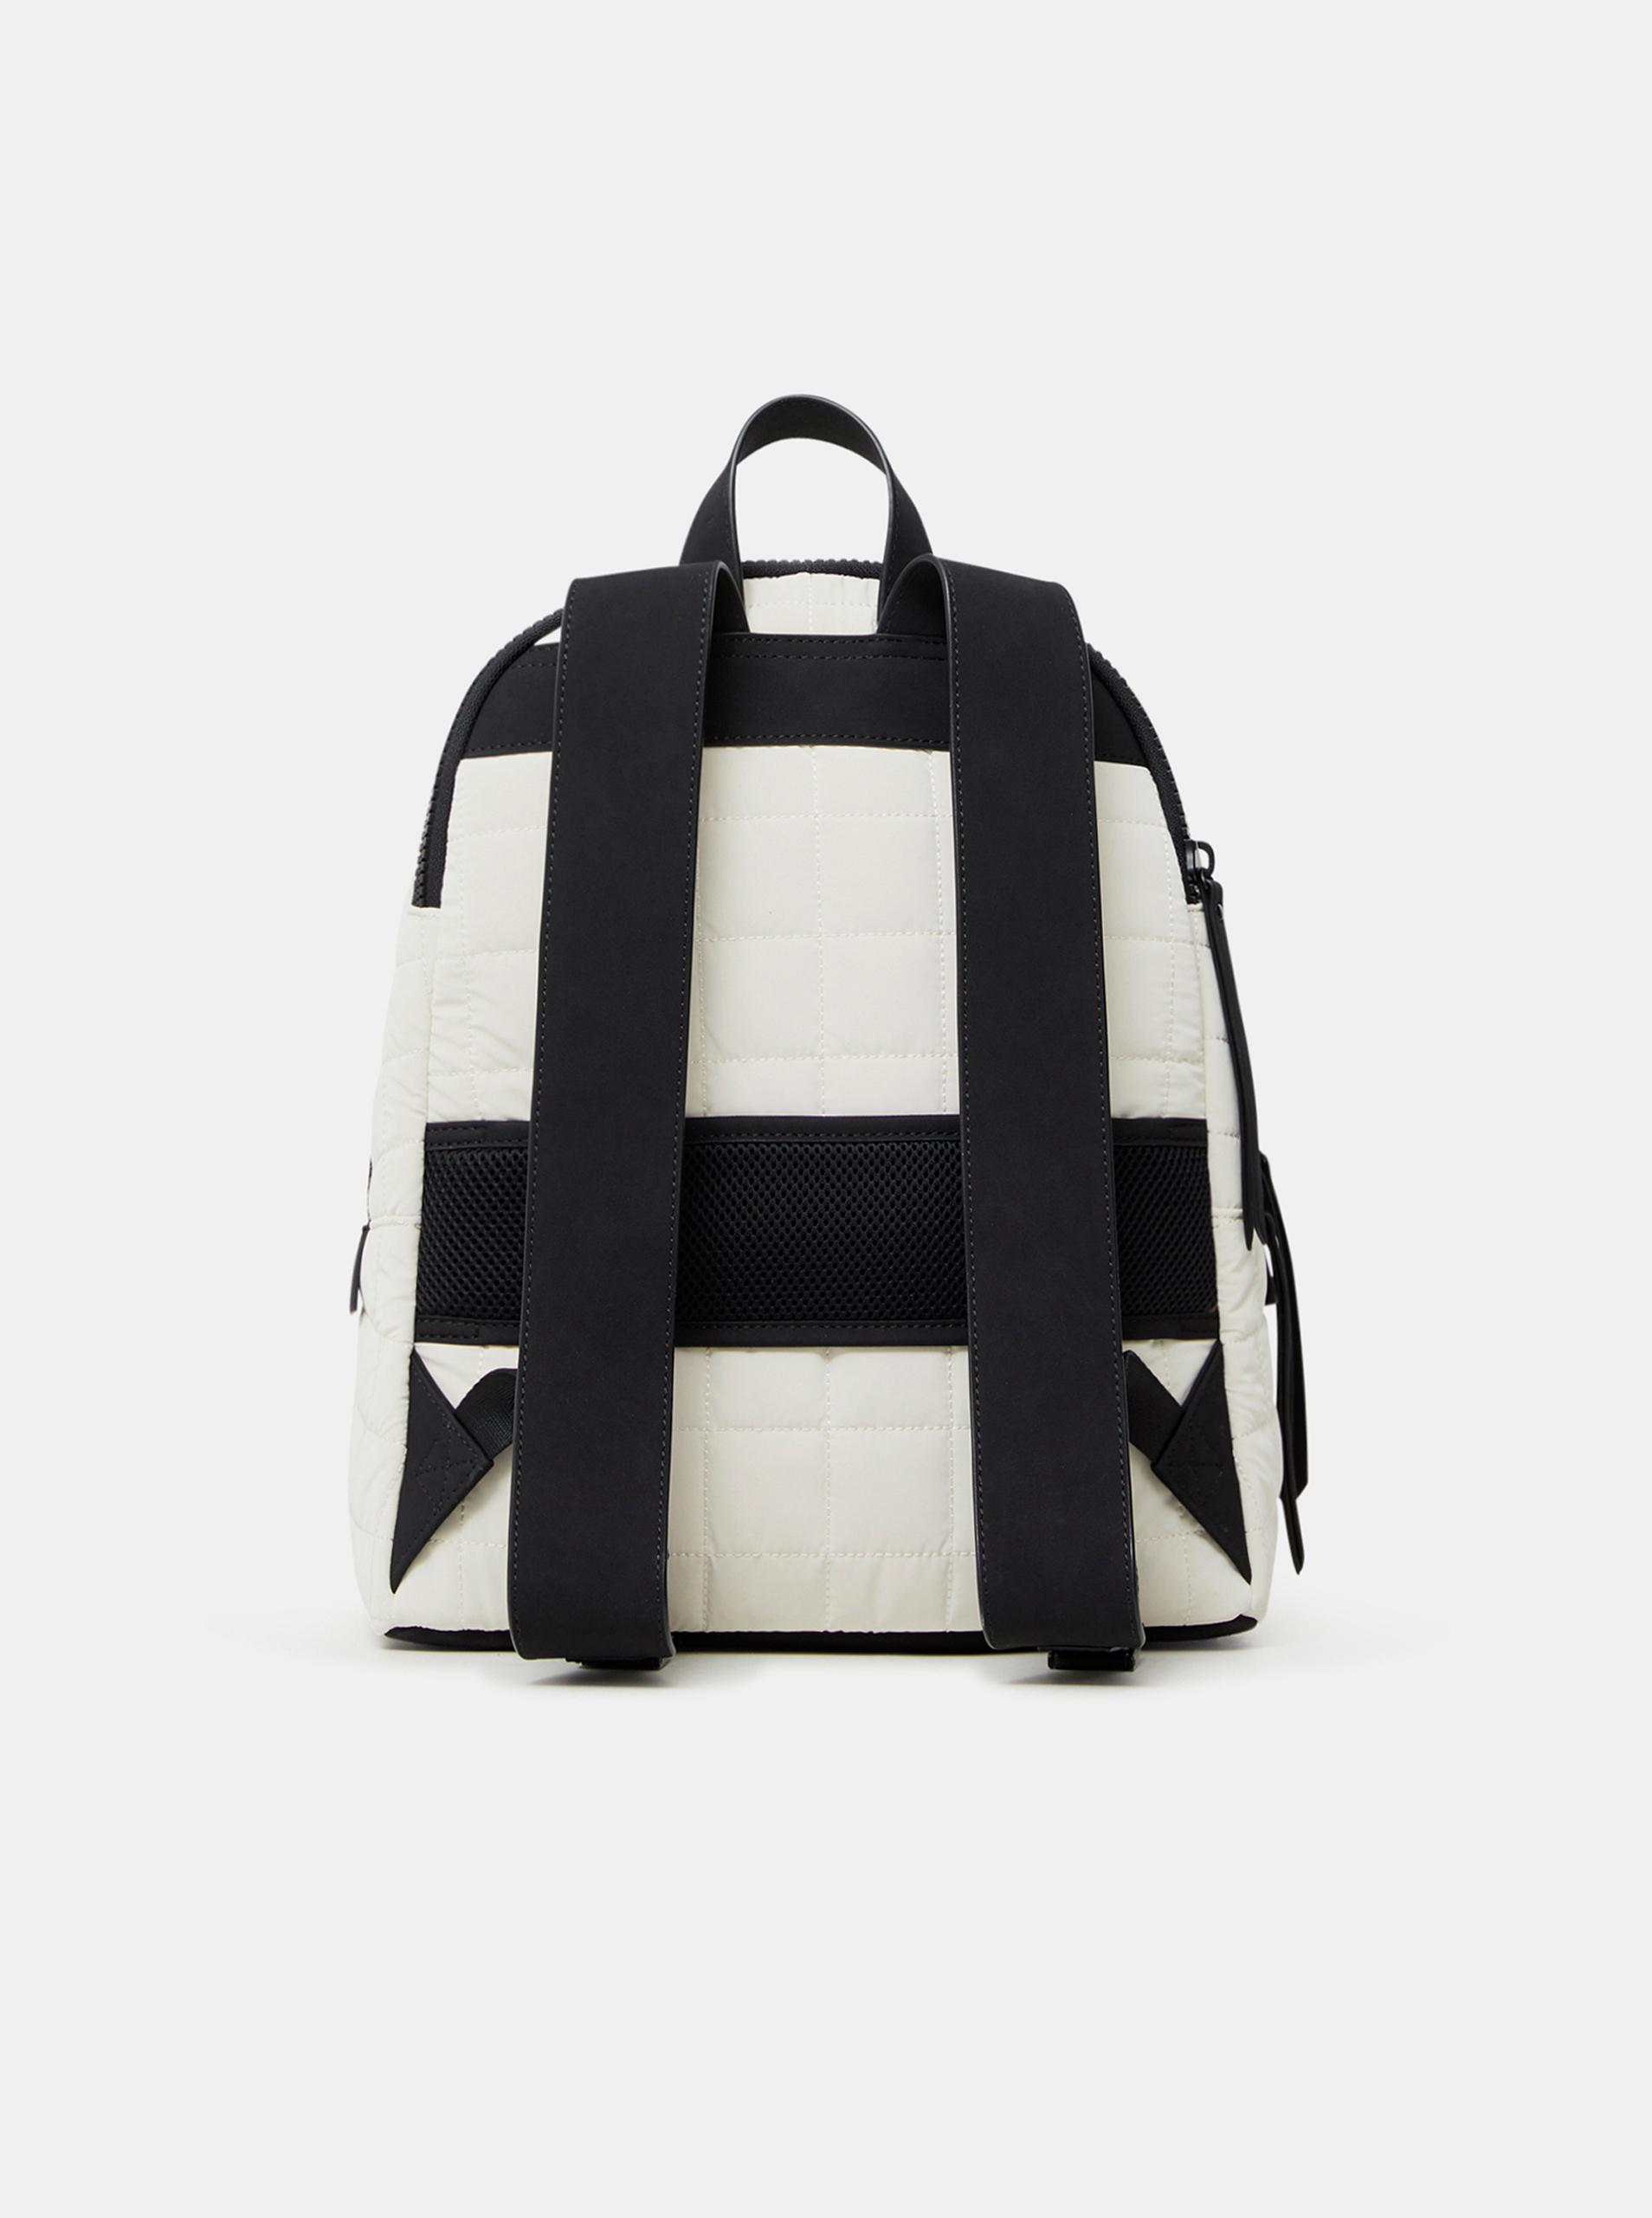 Desigual white backpack Cocoa Mombasa 2zippers